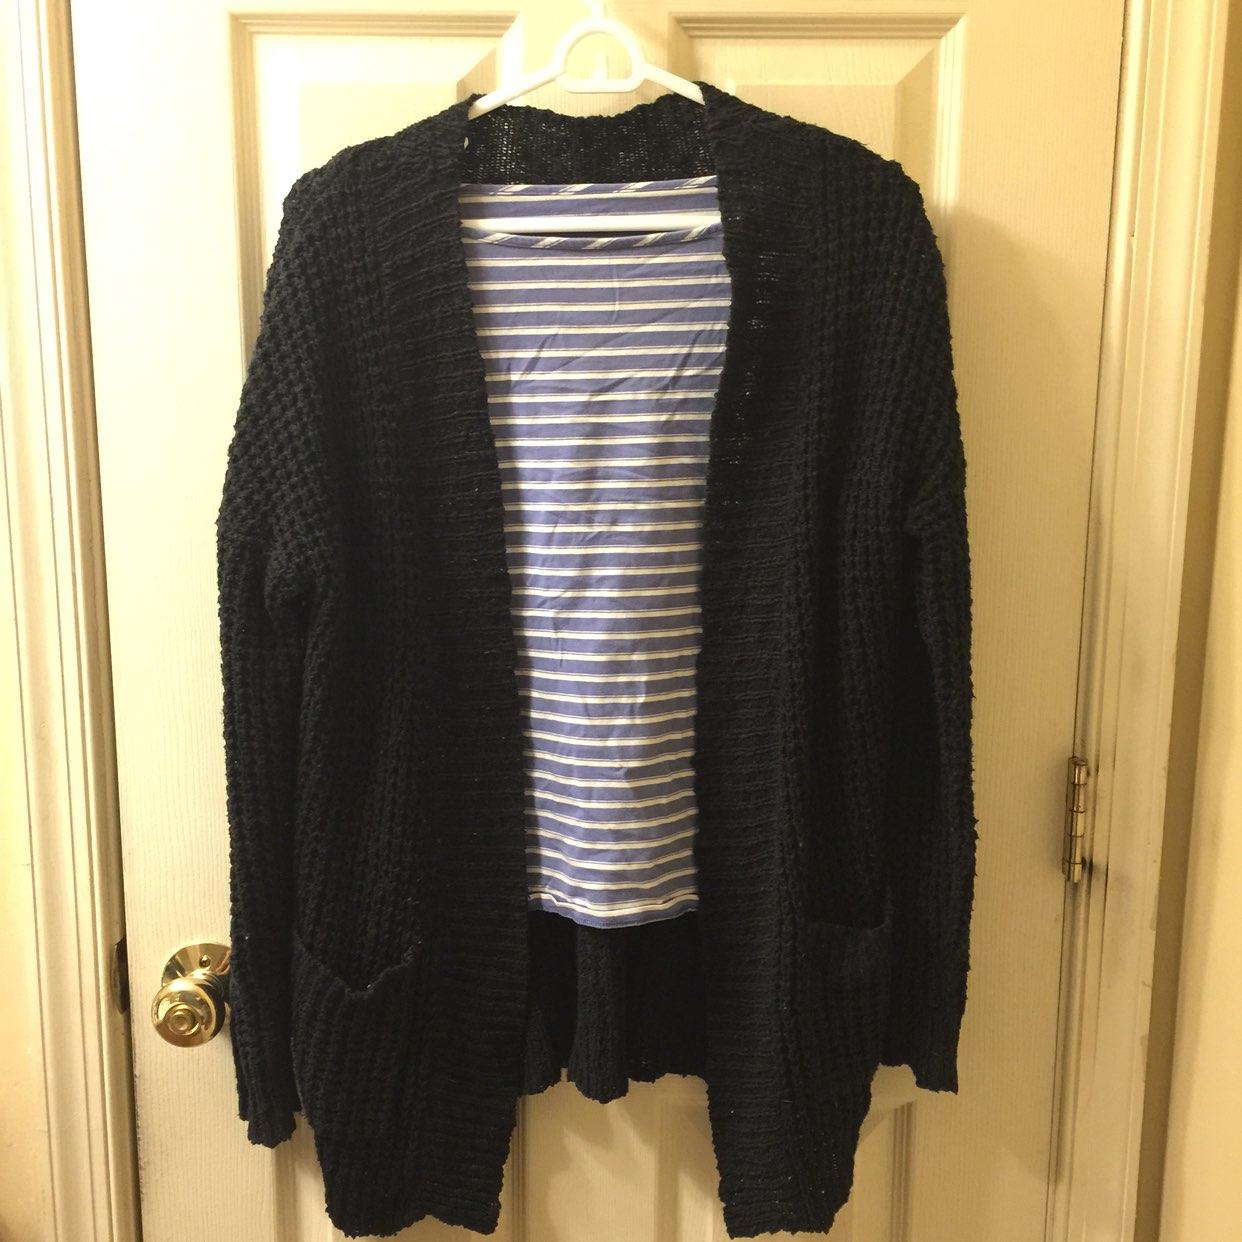 Thick Knit Black Cardigan - Mercari: BUY & SELL THINGS YOU LOVE